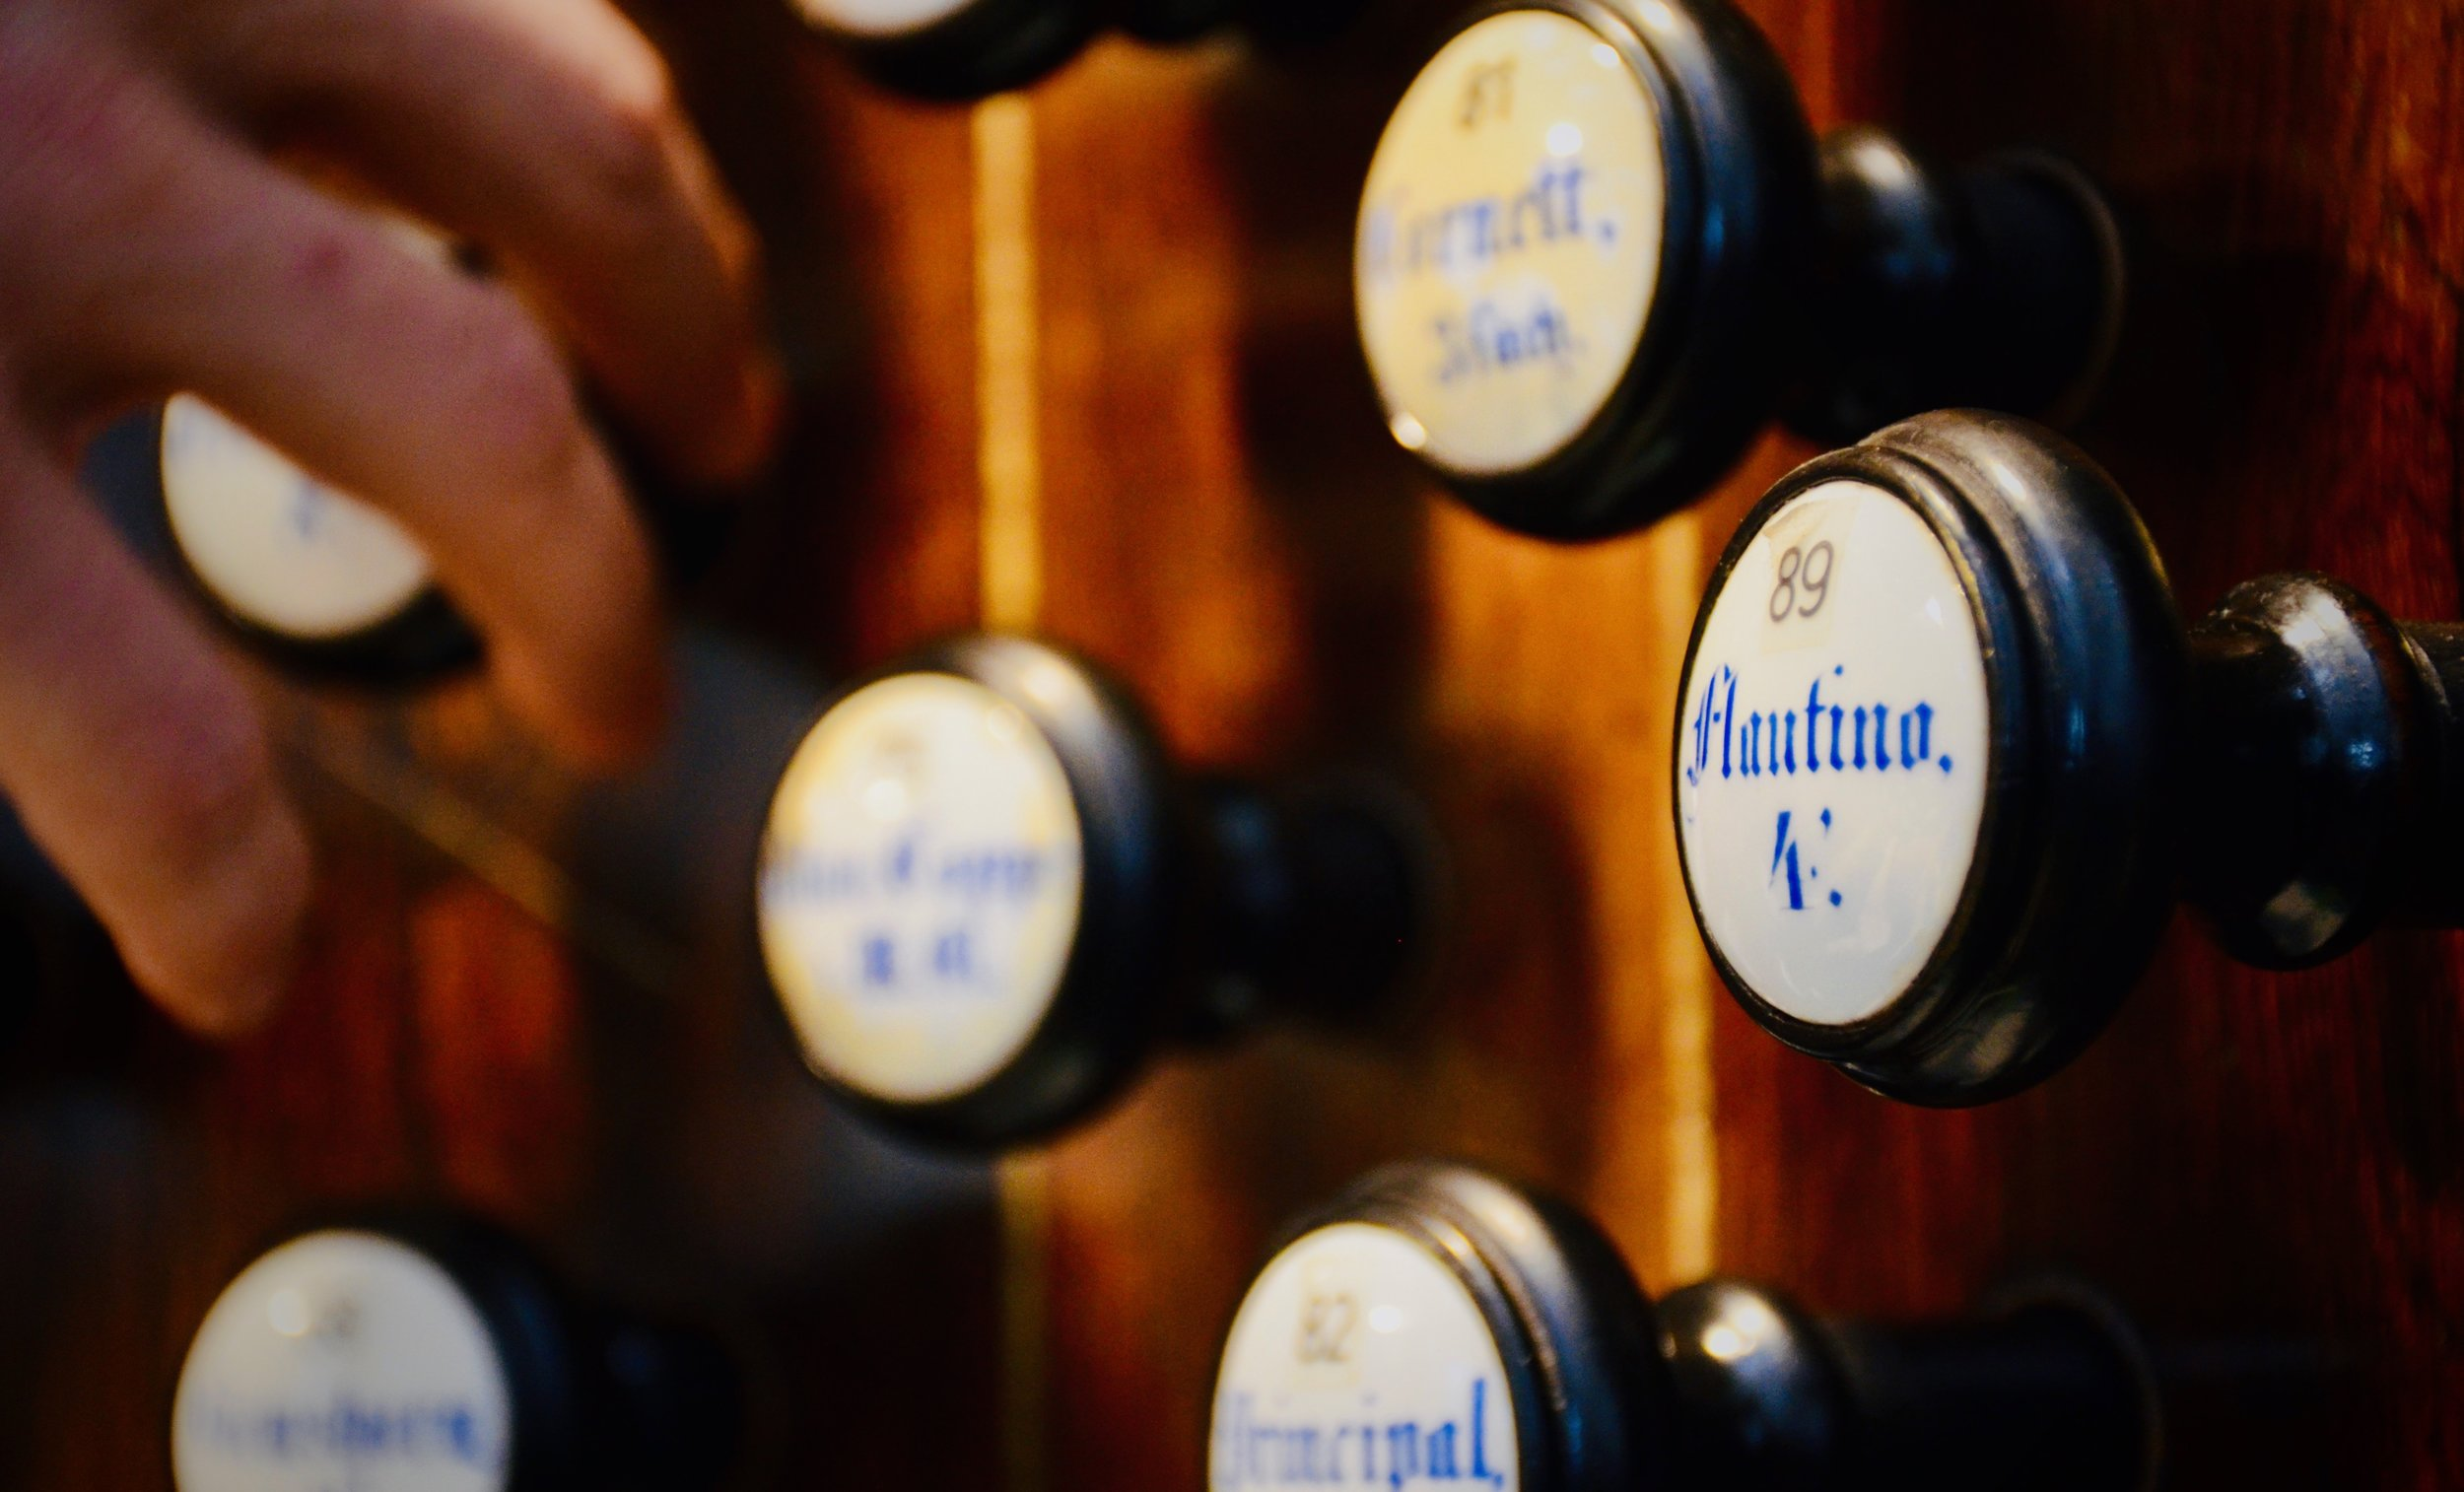 Console detail, 1871 Ladegast Organ, Schwerin Dom. Boston Organ Studio.